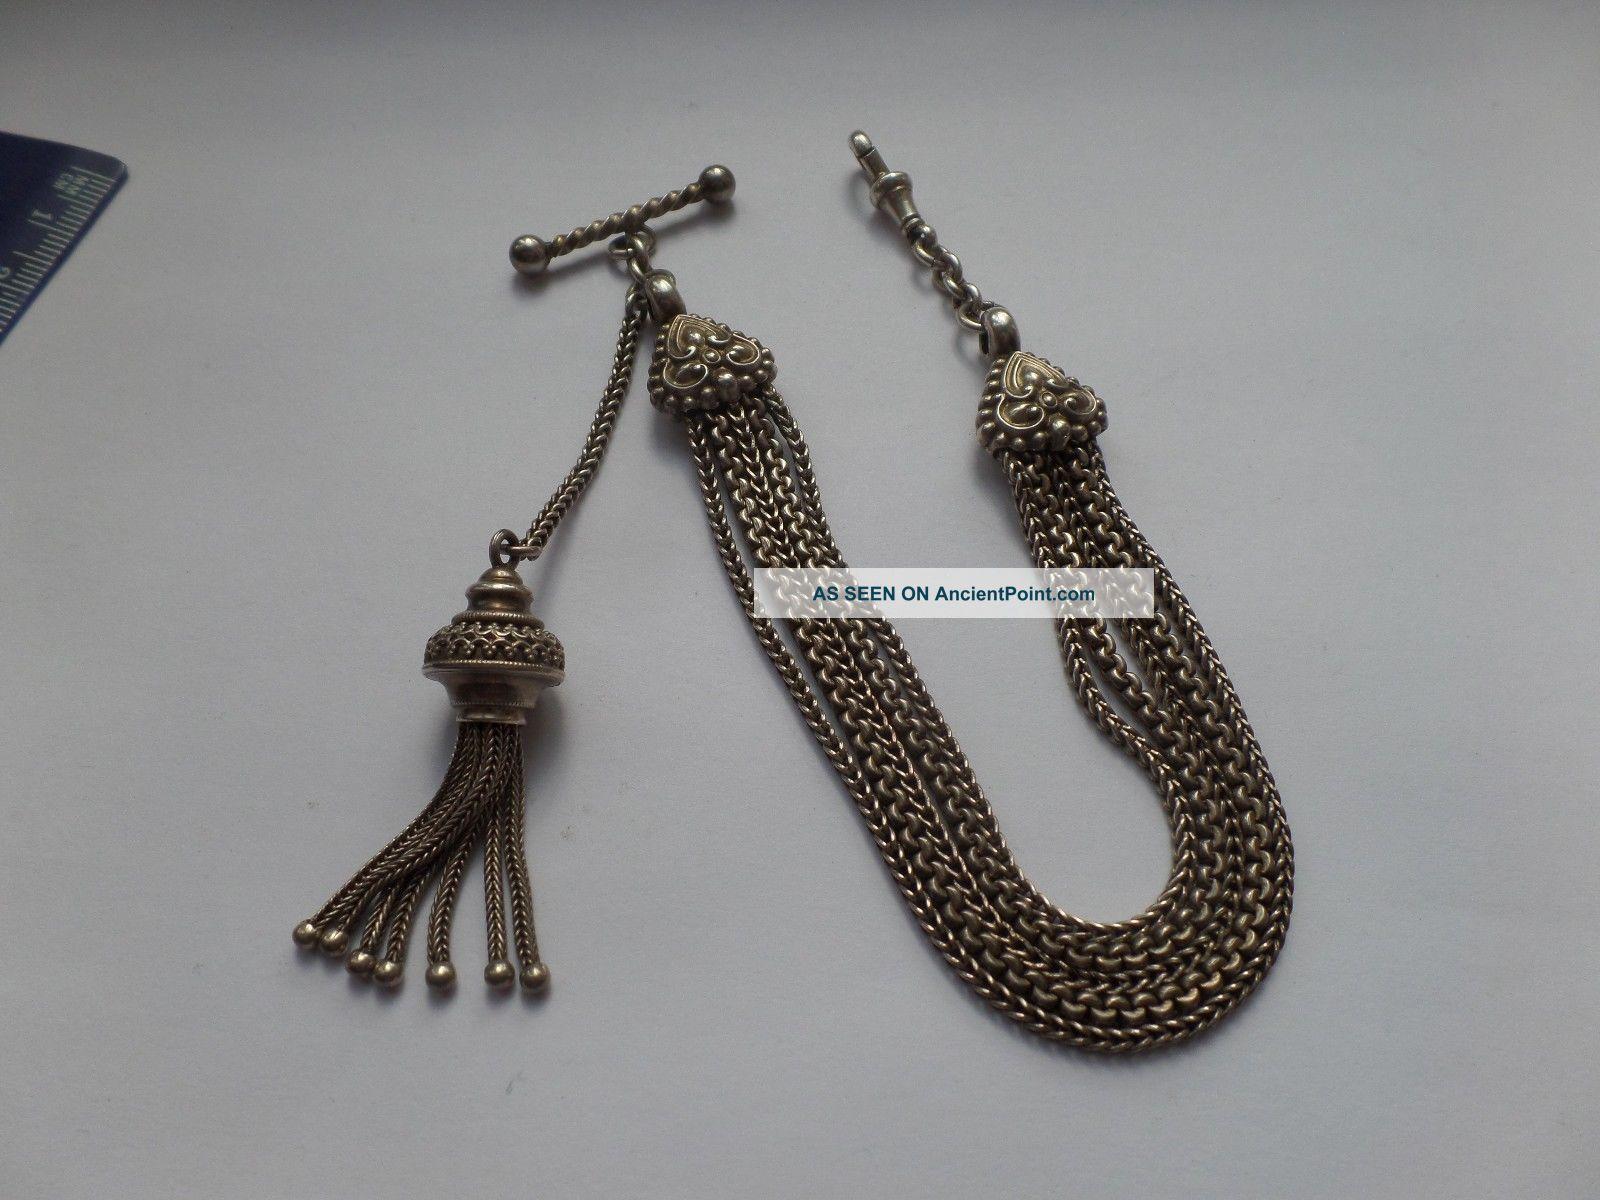 Antique Silver Albertine / Albertina Pocket / Fob Watch Chain & Tassel Pocket Watches/Chains/Fobs photo